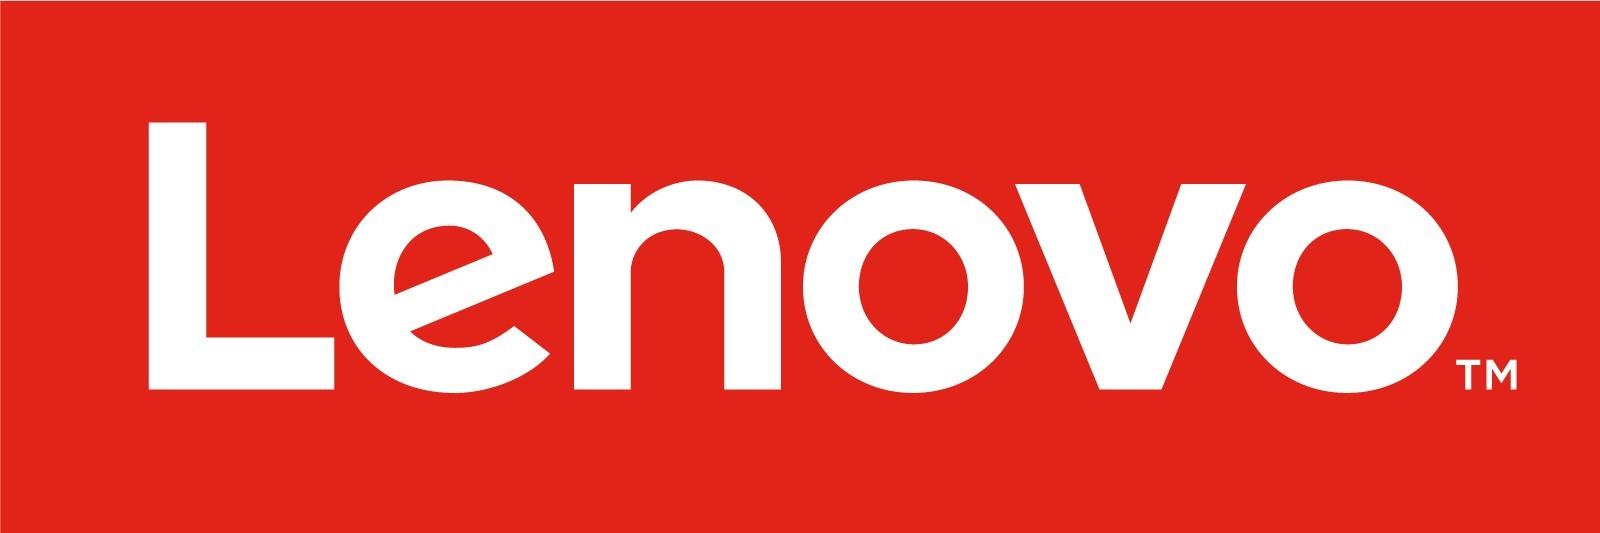 Lenovo logo red